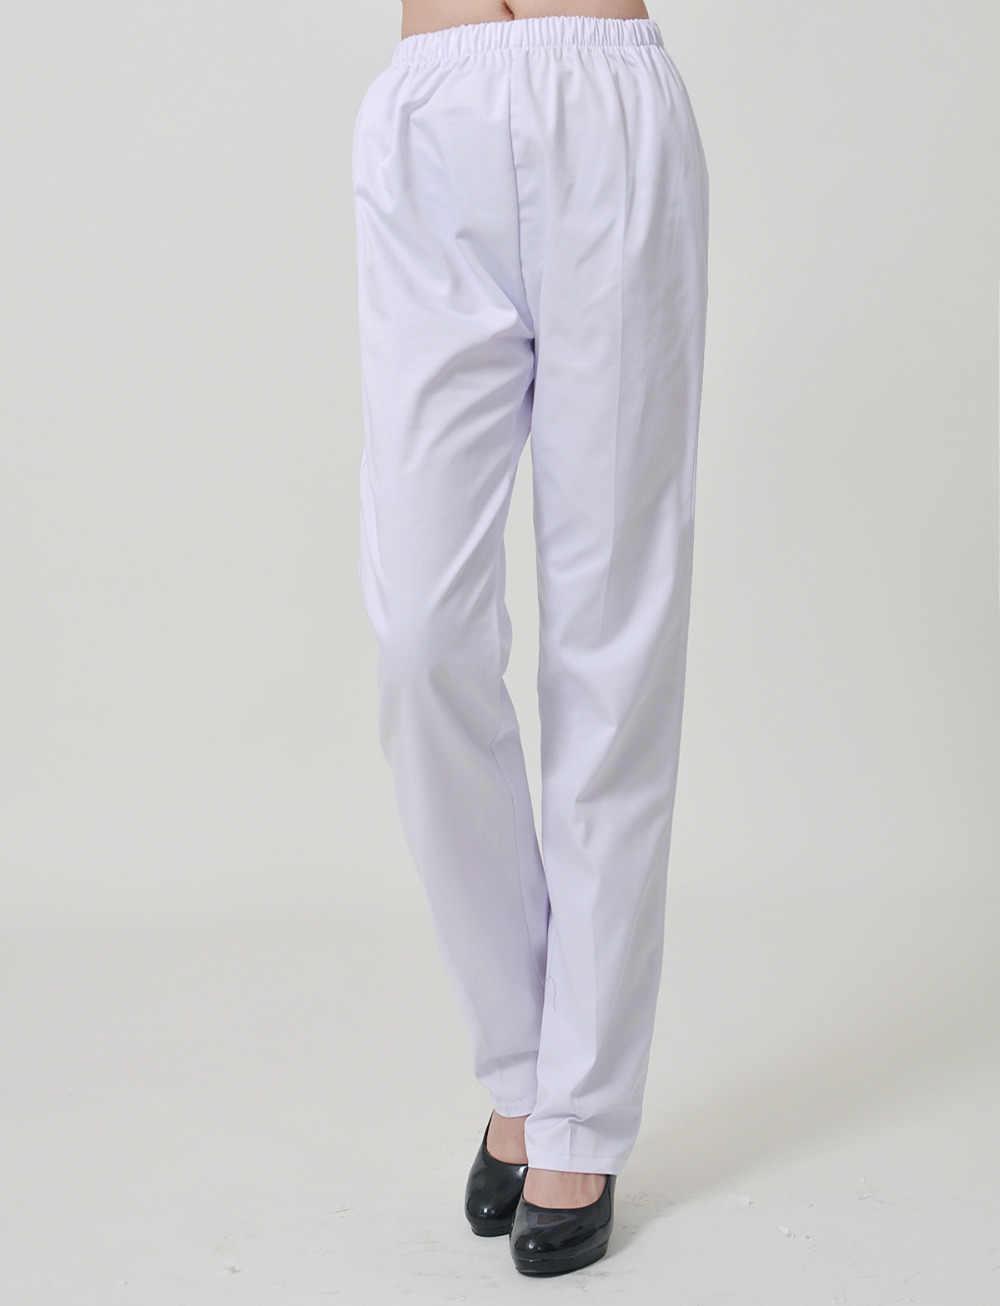 544f7e1cf09 women Medical uniform hospital nursing Nurse Pants White color Work Pants  Elastic Medical Pants Trousers Female